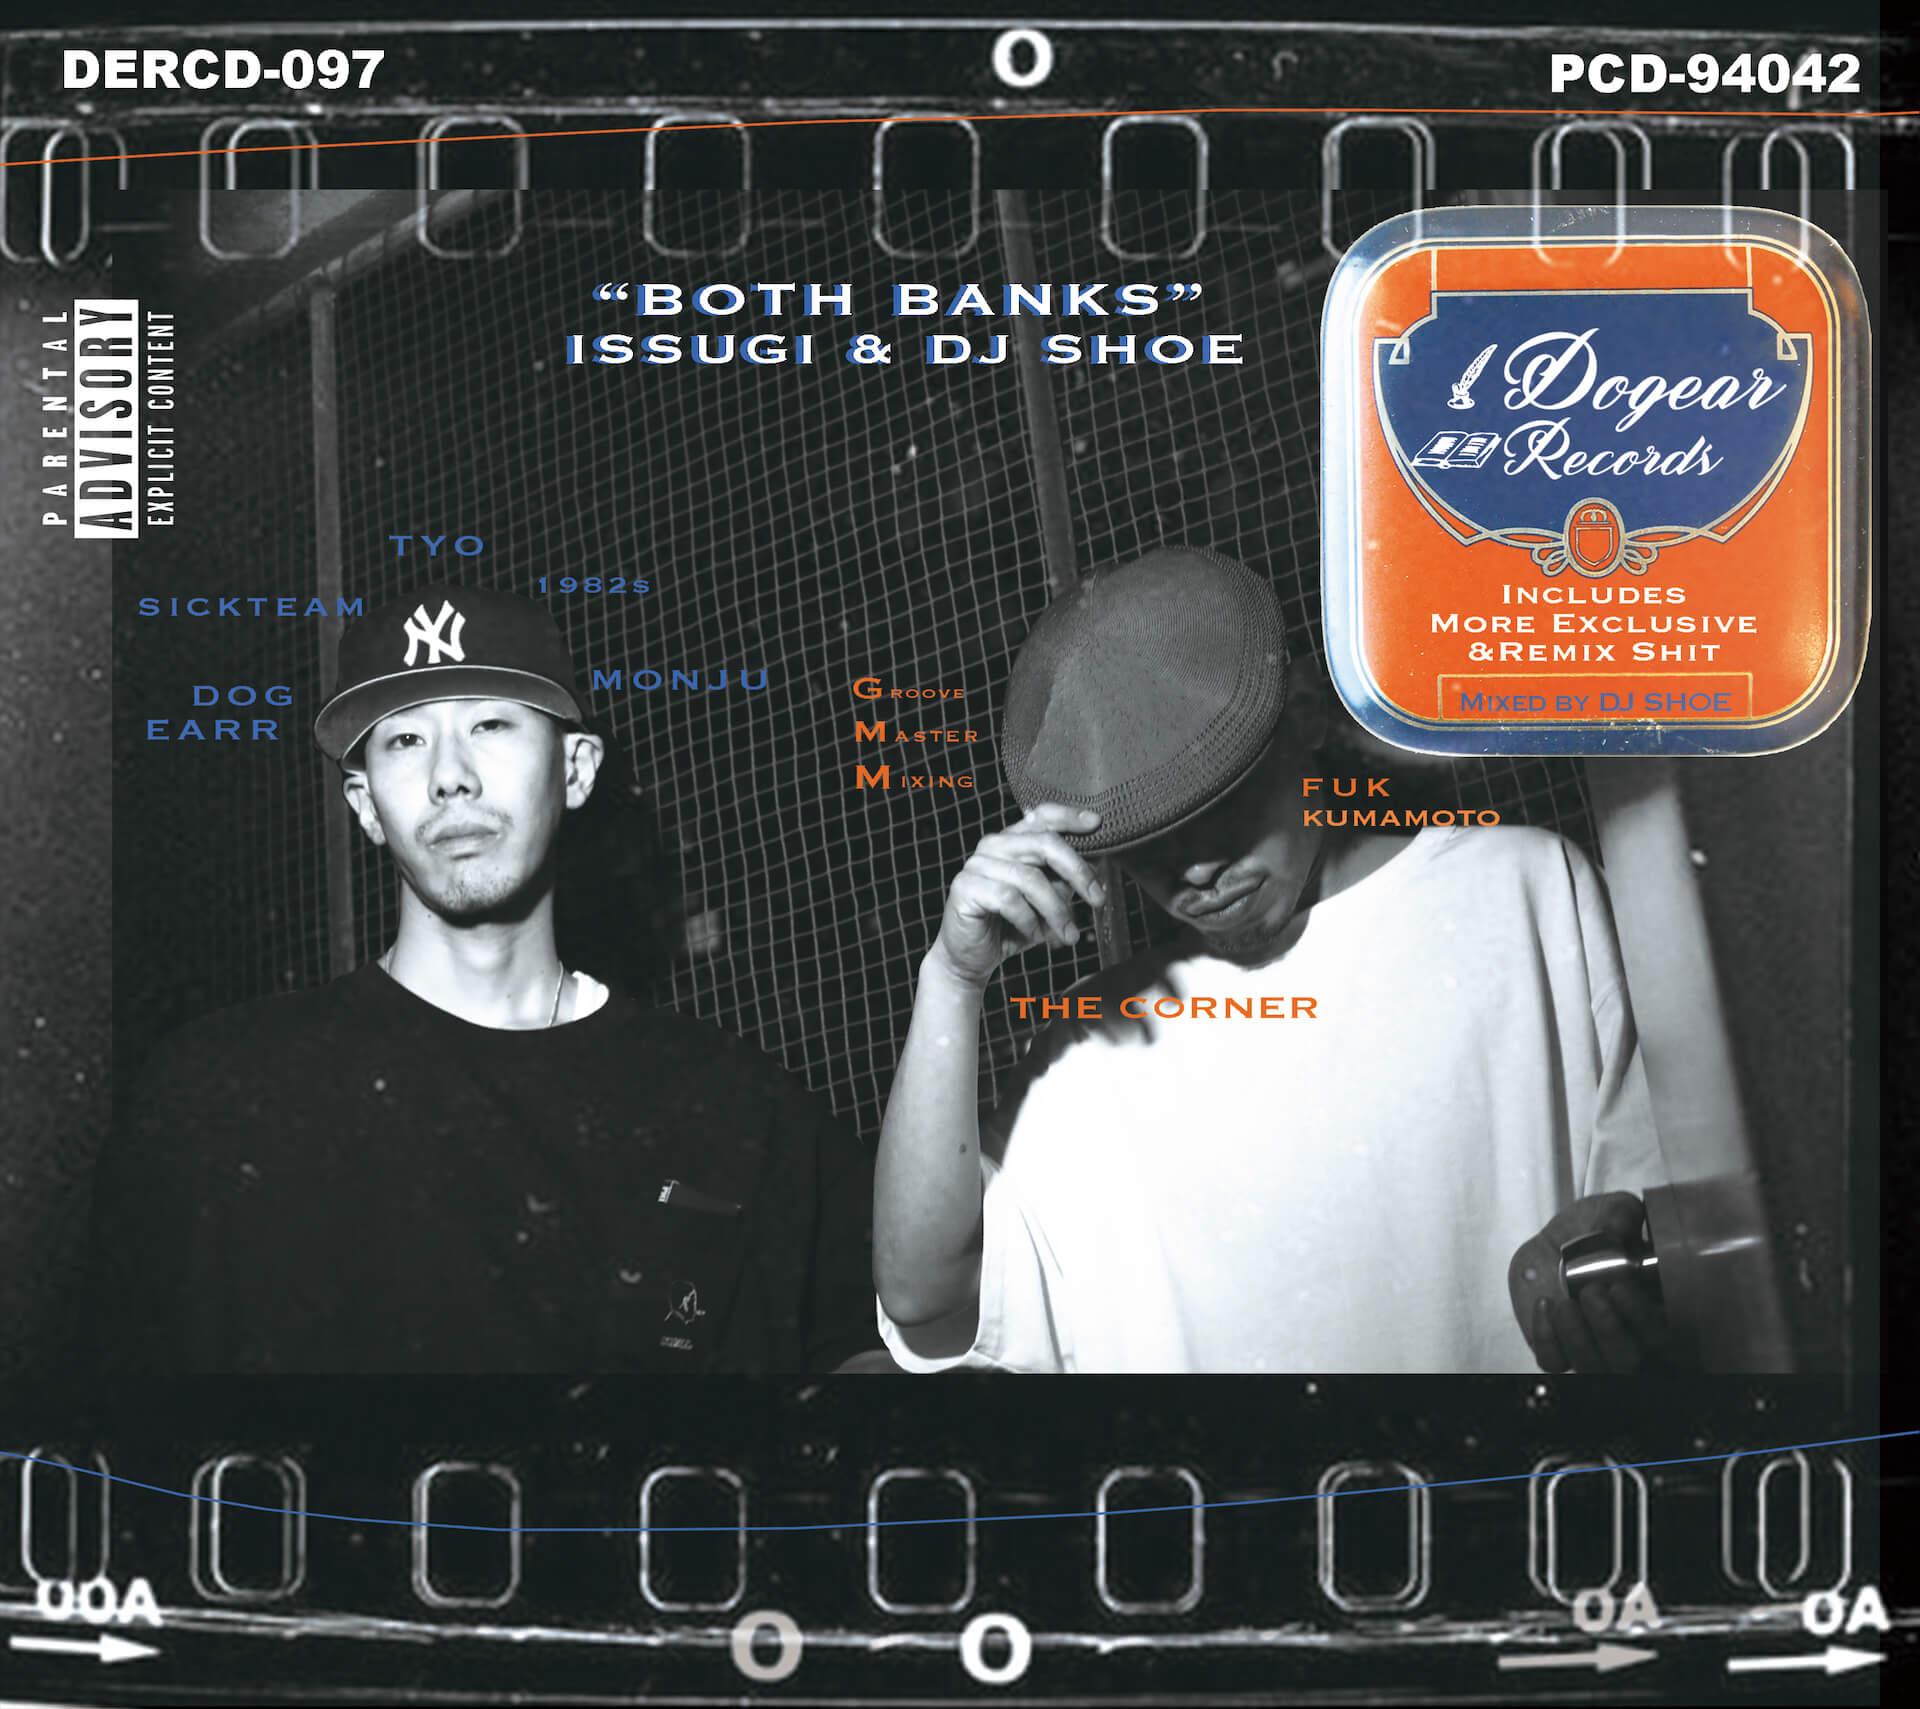 ISSUGI & DJ SHOEのミックスアルバム『Both Banks』がついにリリース!BLACKFILEでのインタビュー映像が公開 music210728_issugi_djshoe_1